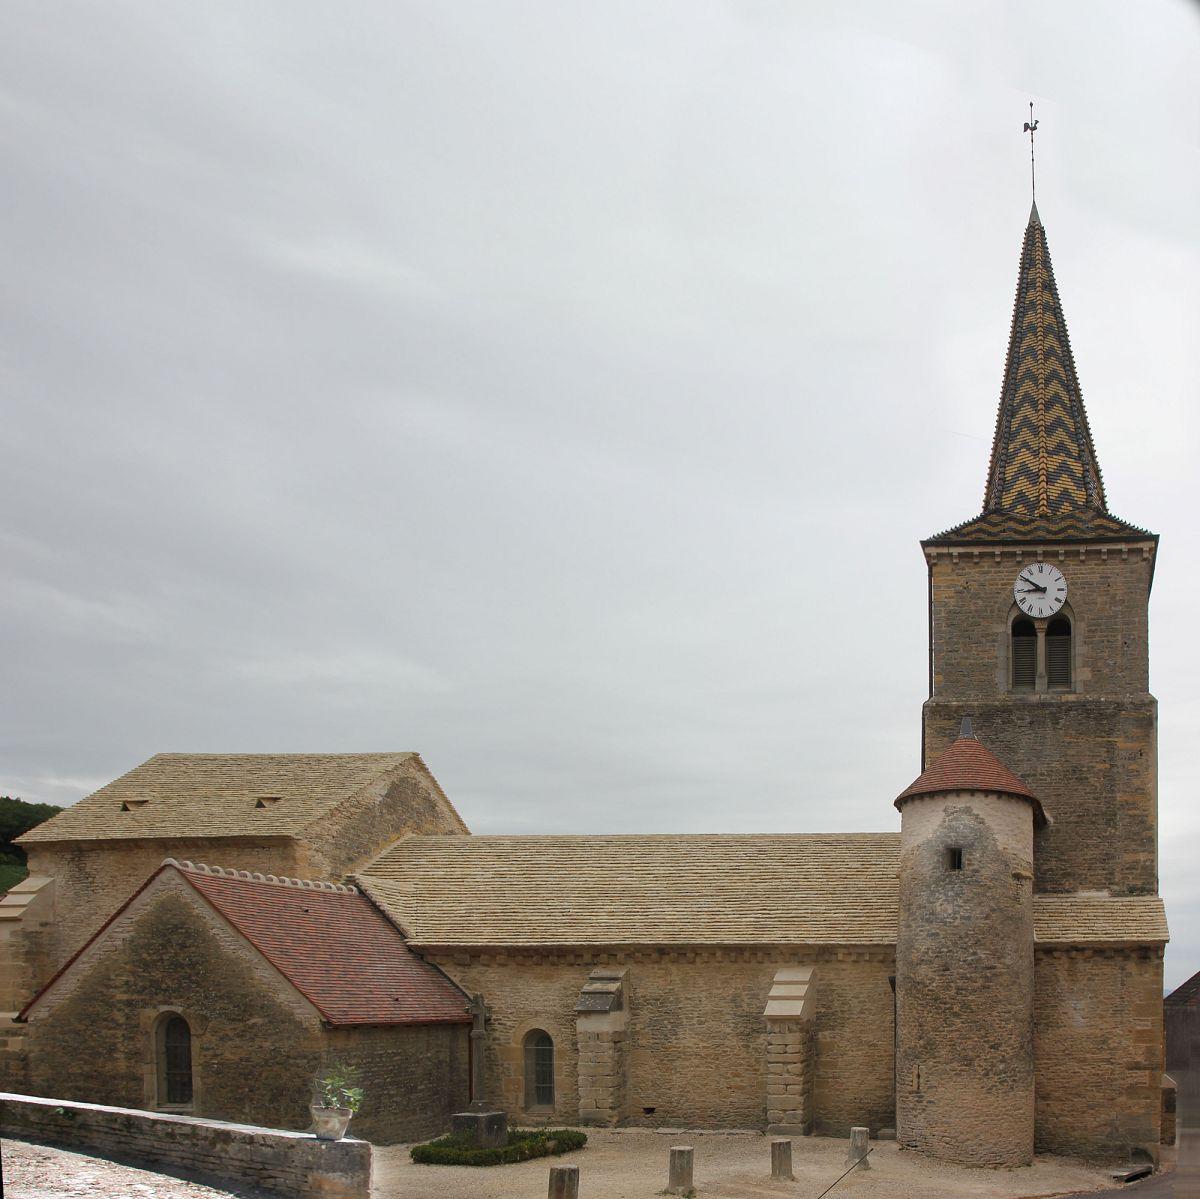 Pernand-Vergelesses - Eglise Saint-Germain (21) [2]